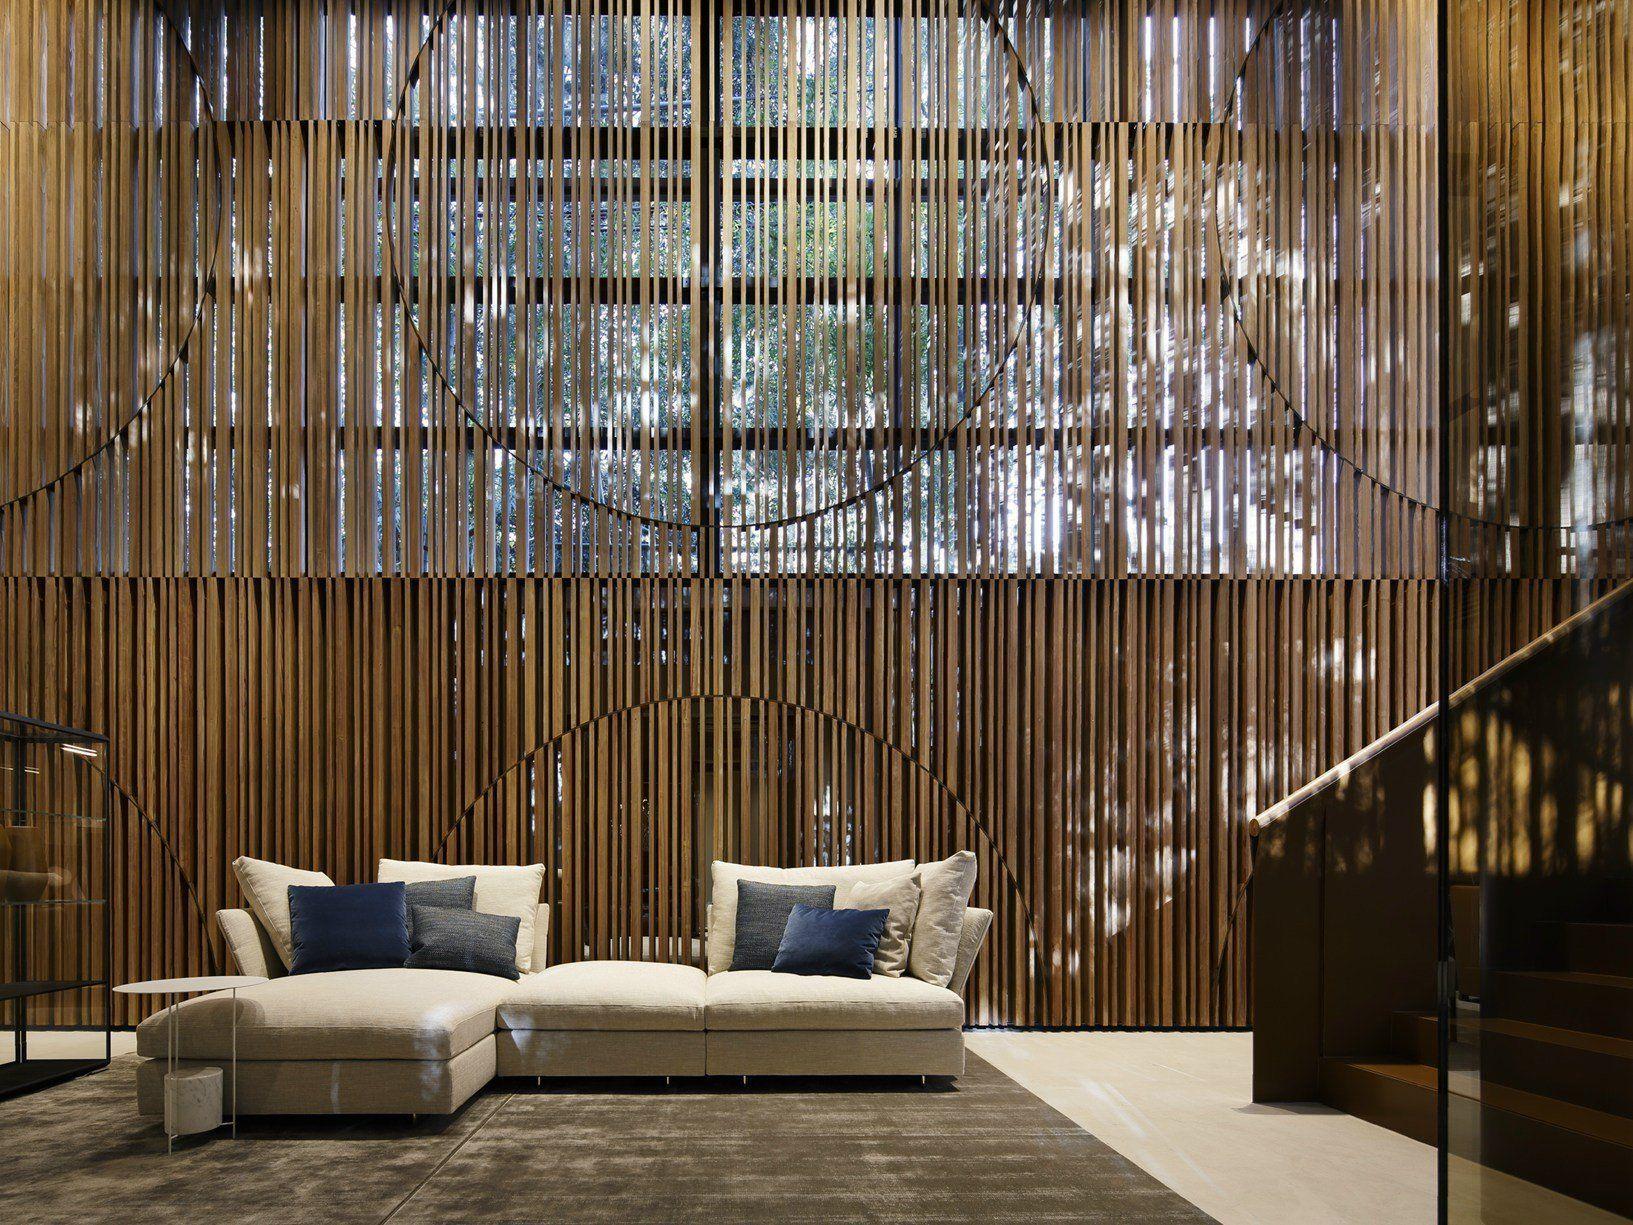 Molteni C Flagship Store Designed By Patricia Urquiola Opens In Tokyo # Muebles Jardin Tokyo